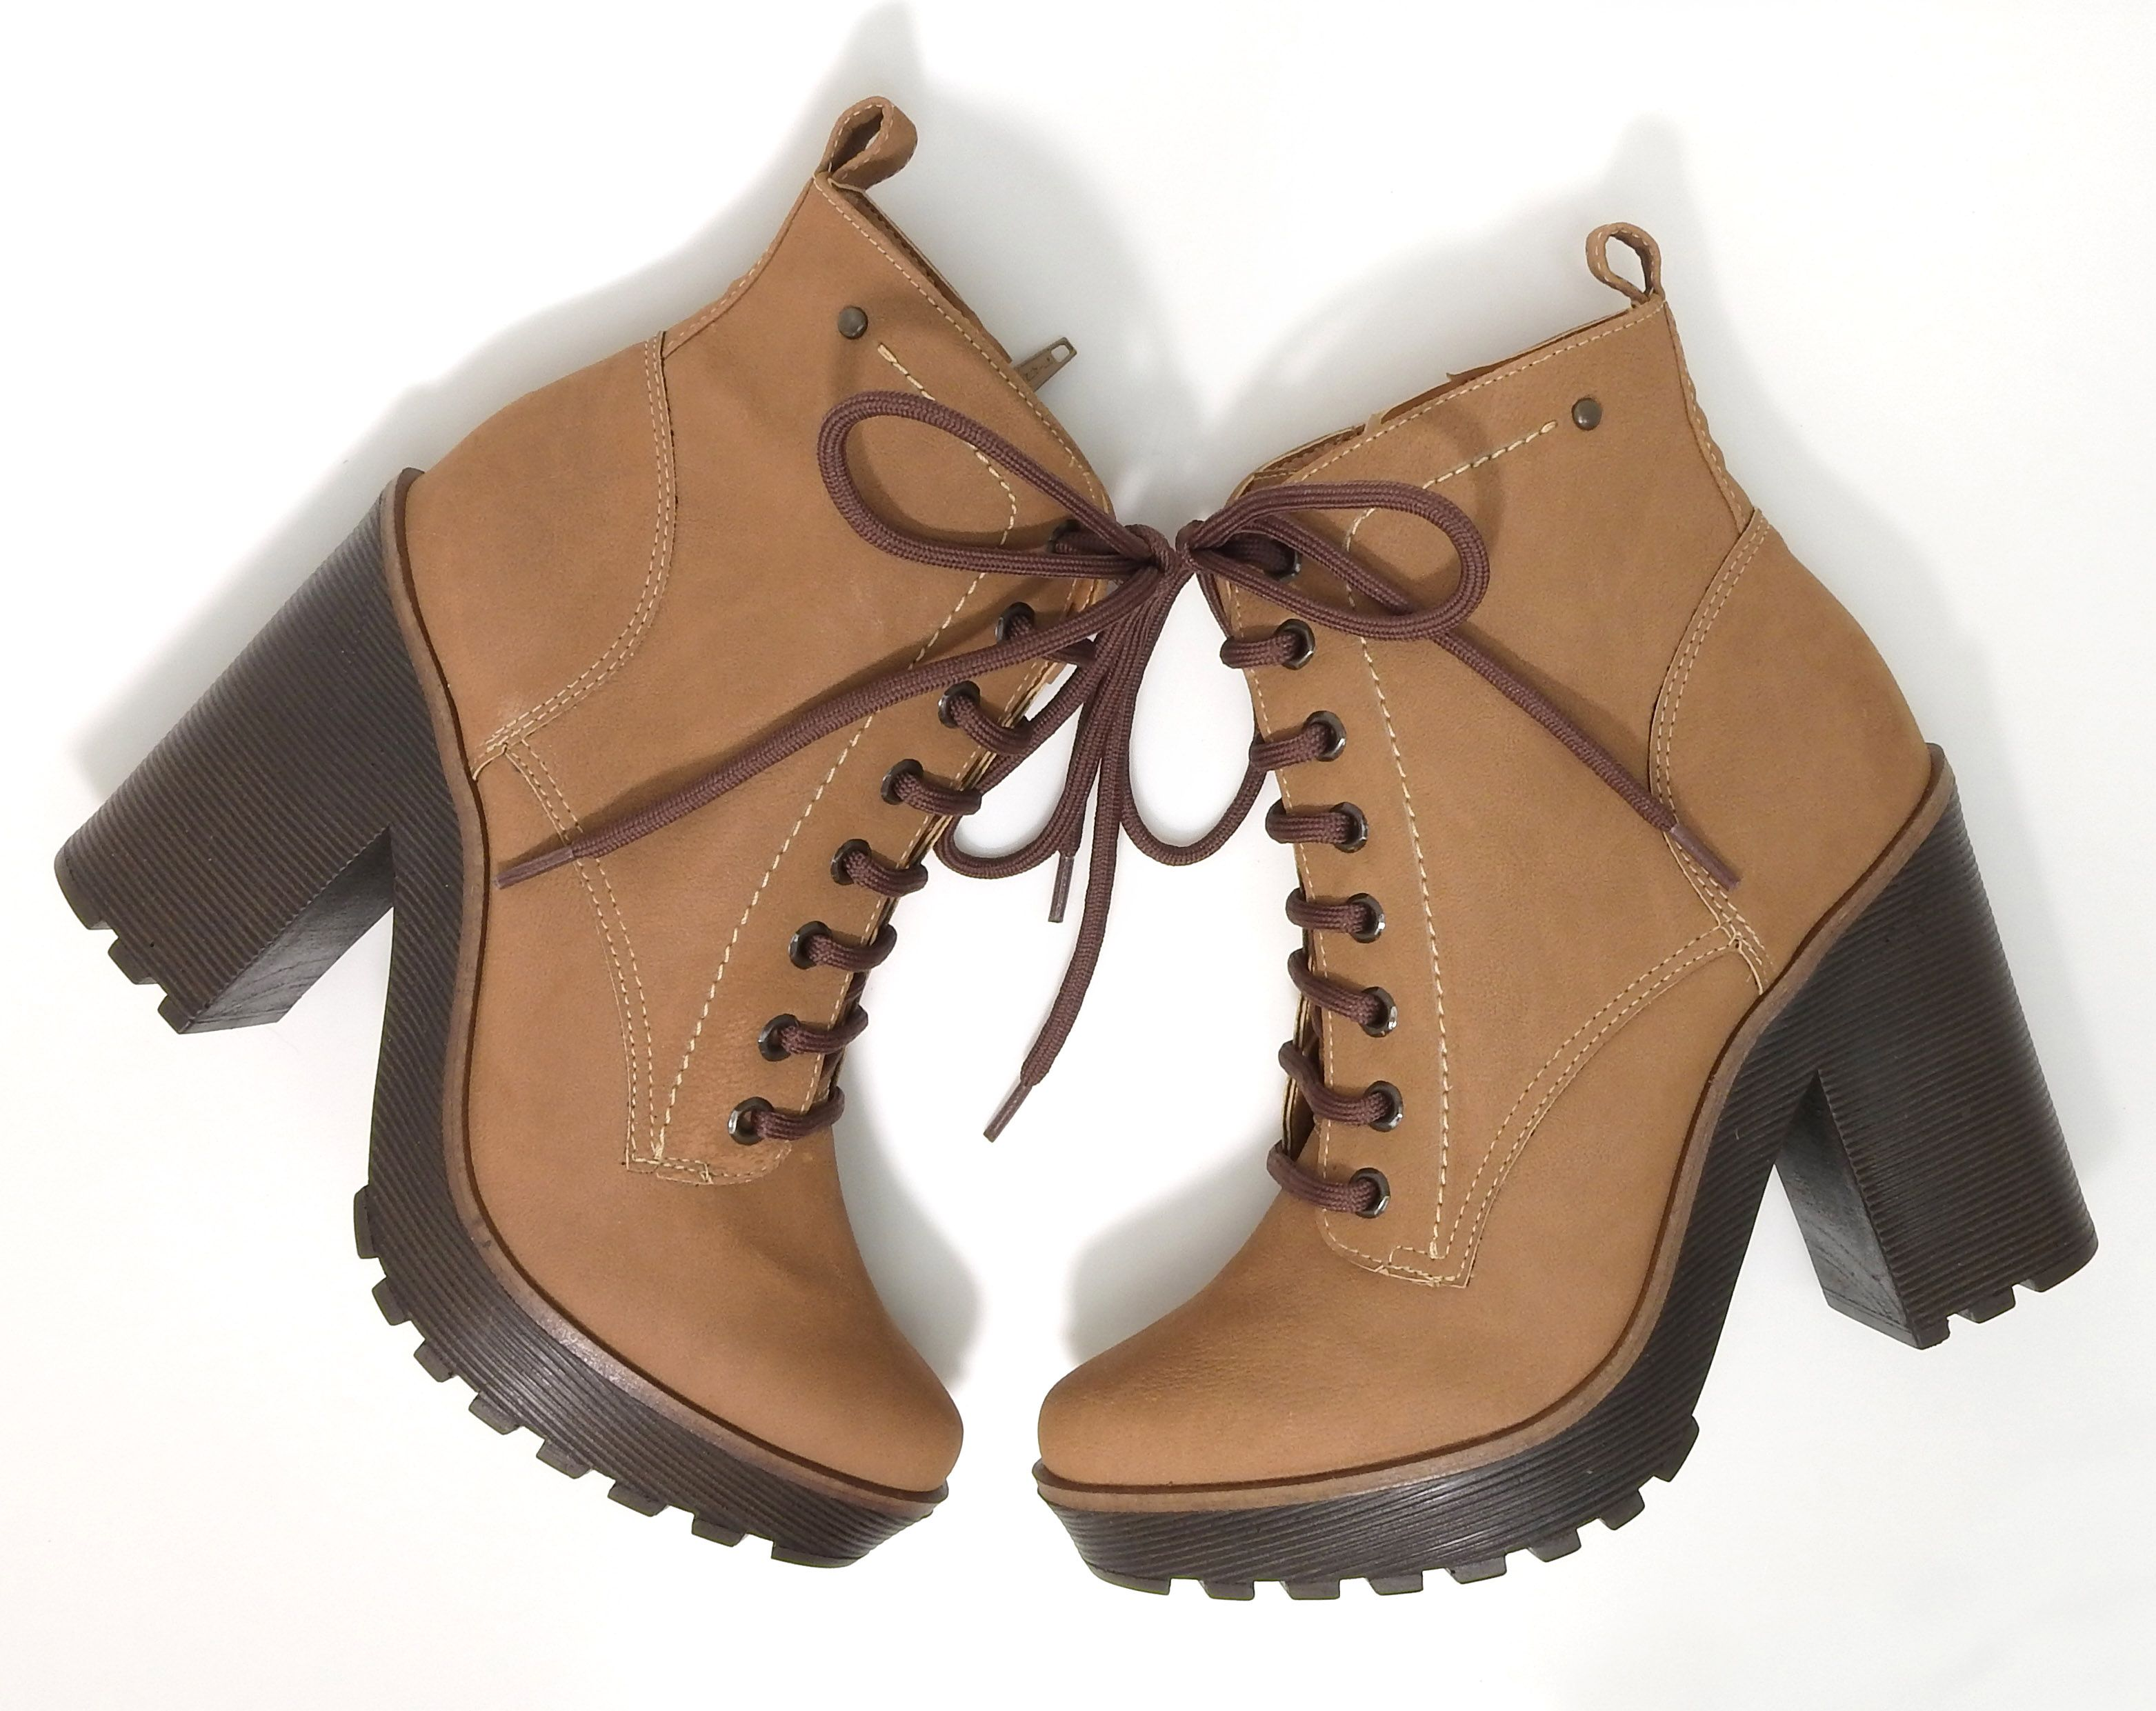 768c7b08ec boots - coturno - bota com salto alto - Inverno 2016 - Ref. 16-5805 ...